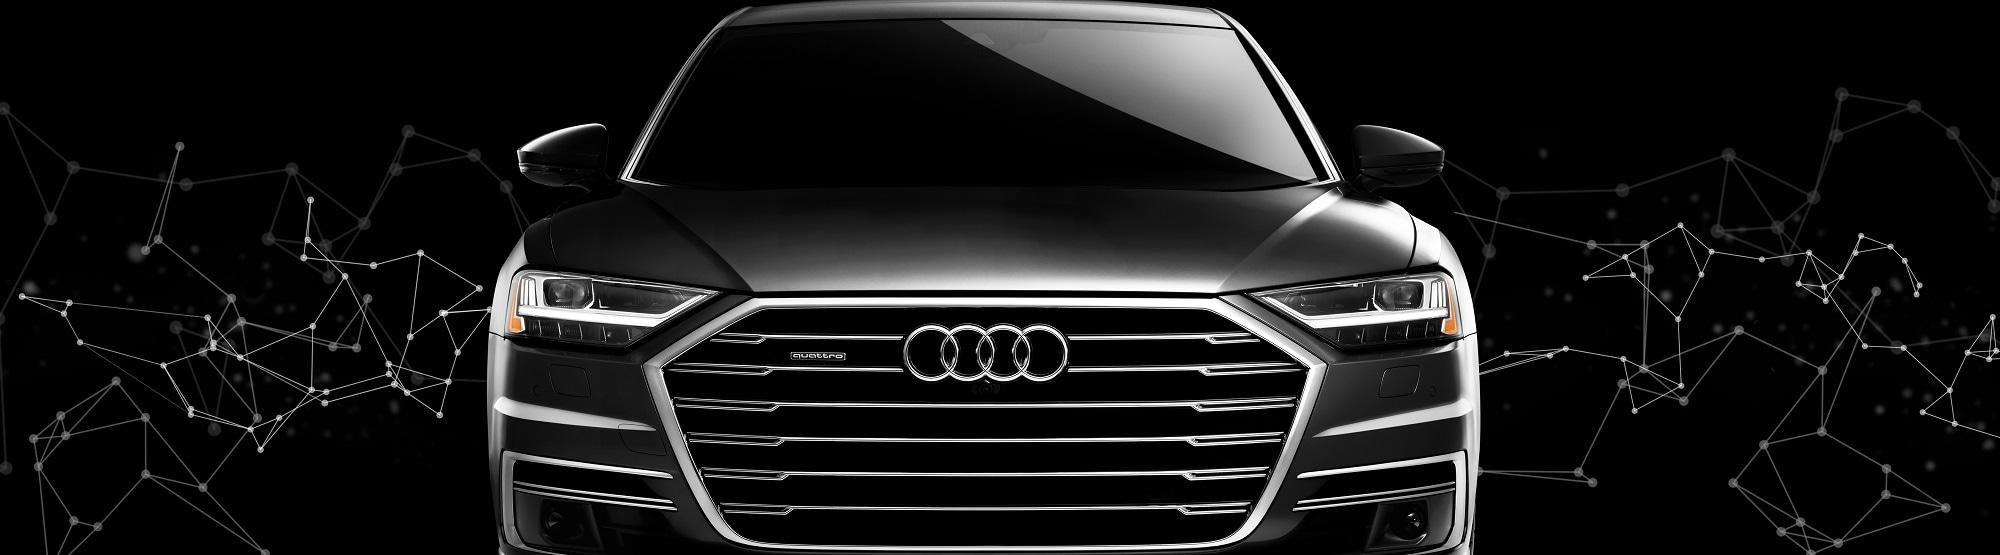 2019 Audi Q3 Vs Volvo Xc40 South Burlington Vt Audi Dealer